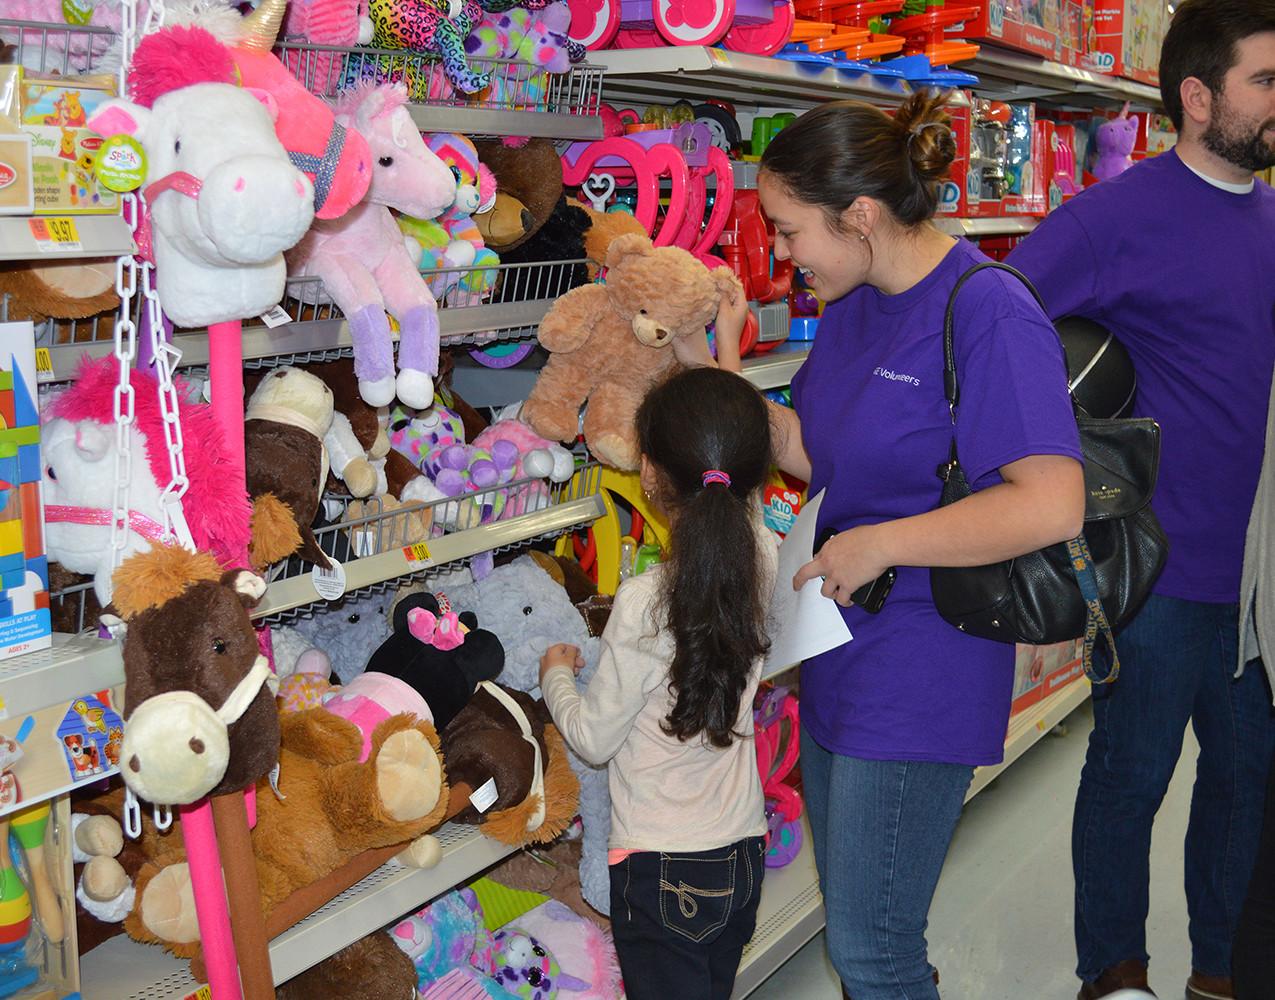 GE Holiday Shopping 12.7.17 (7)